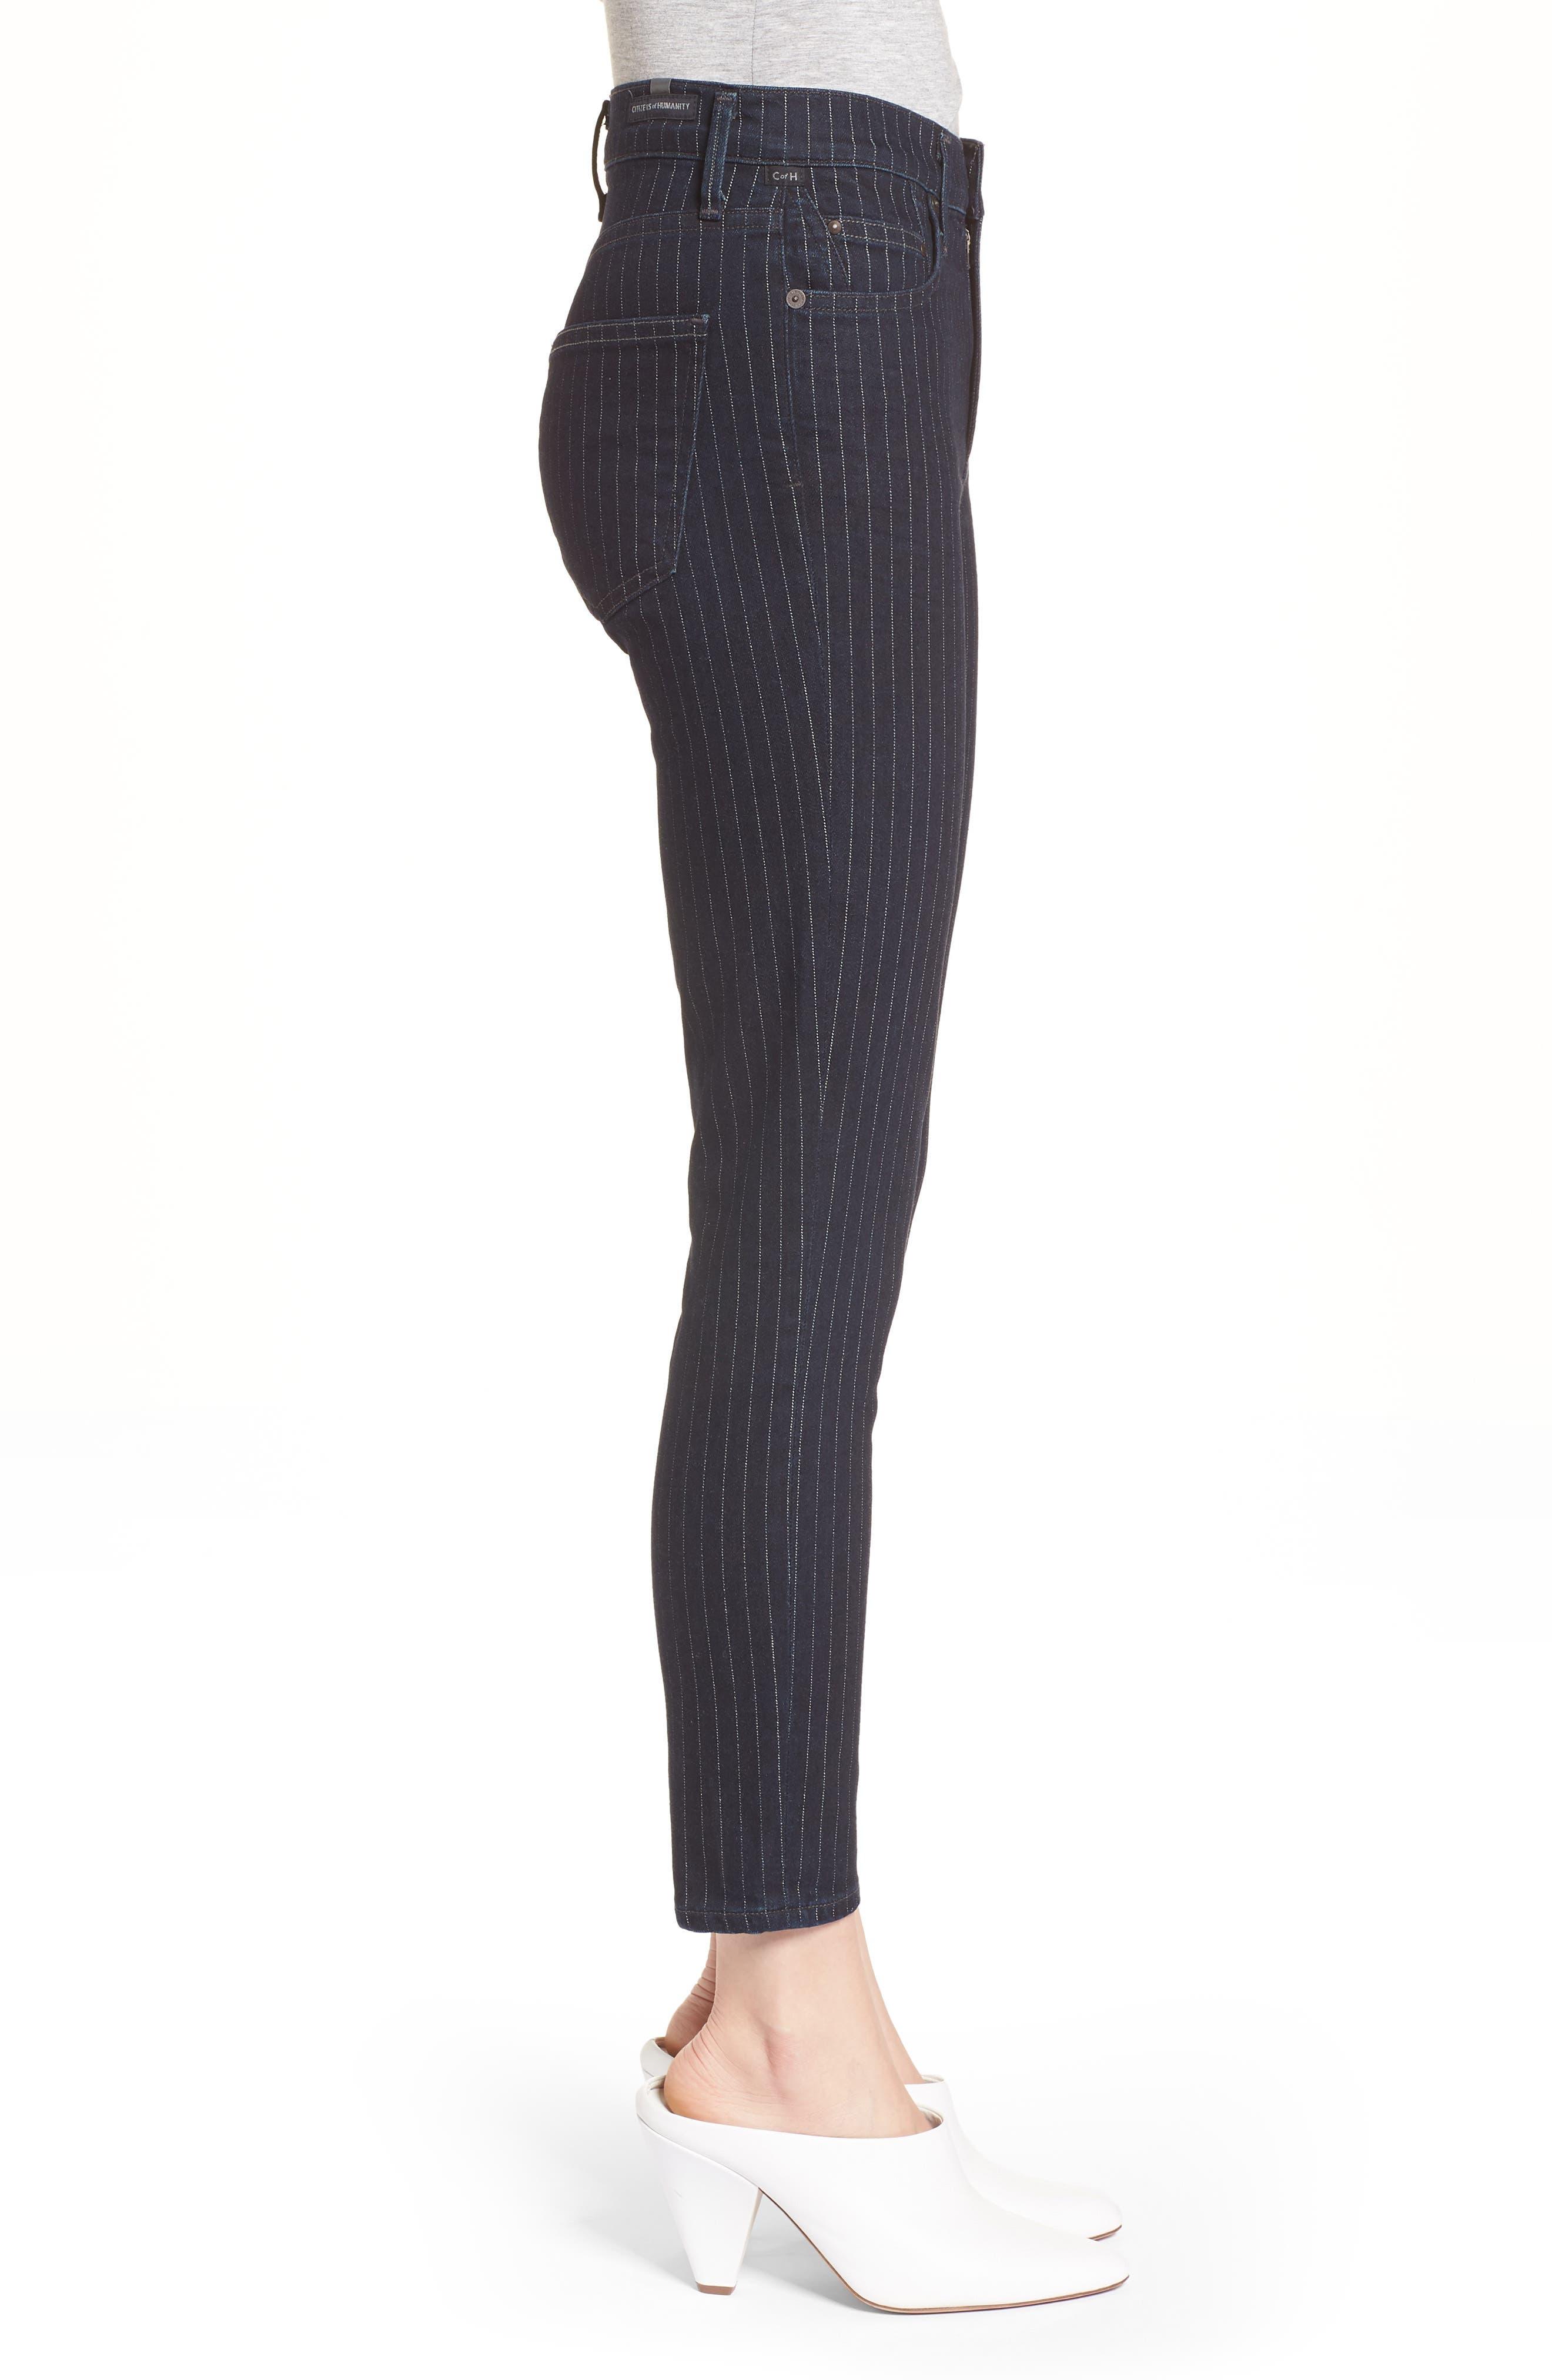 Rocket High Waist Crop Skinny Jeans,                             Alternate thumbnail 3, color,